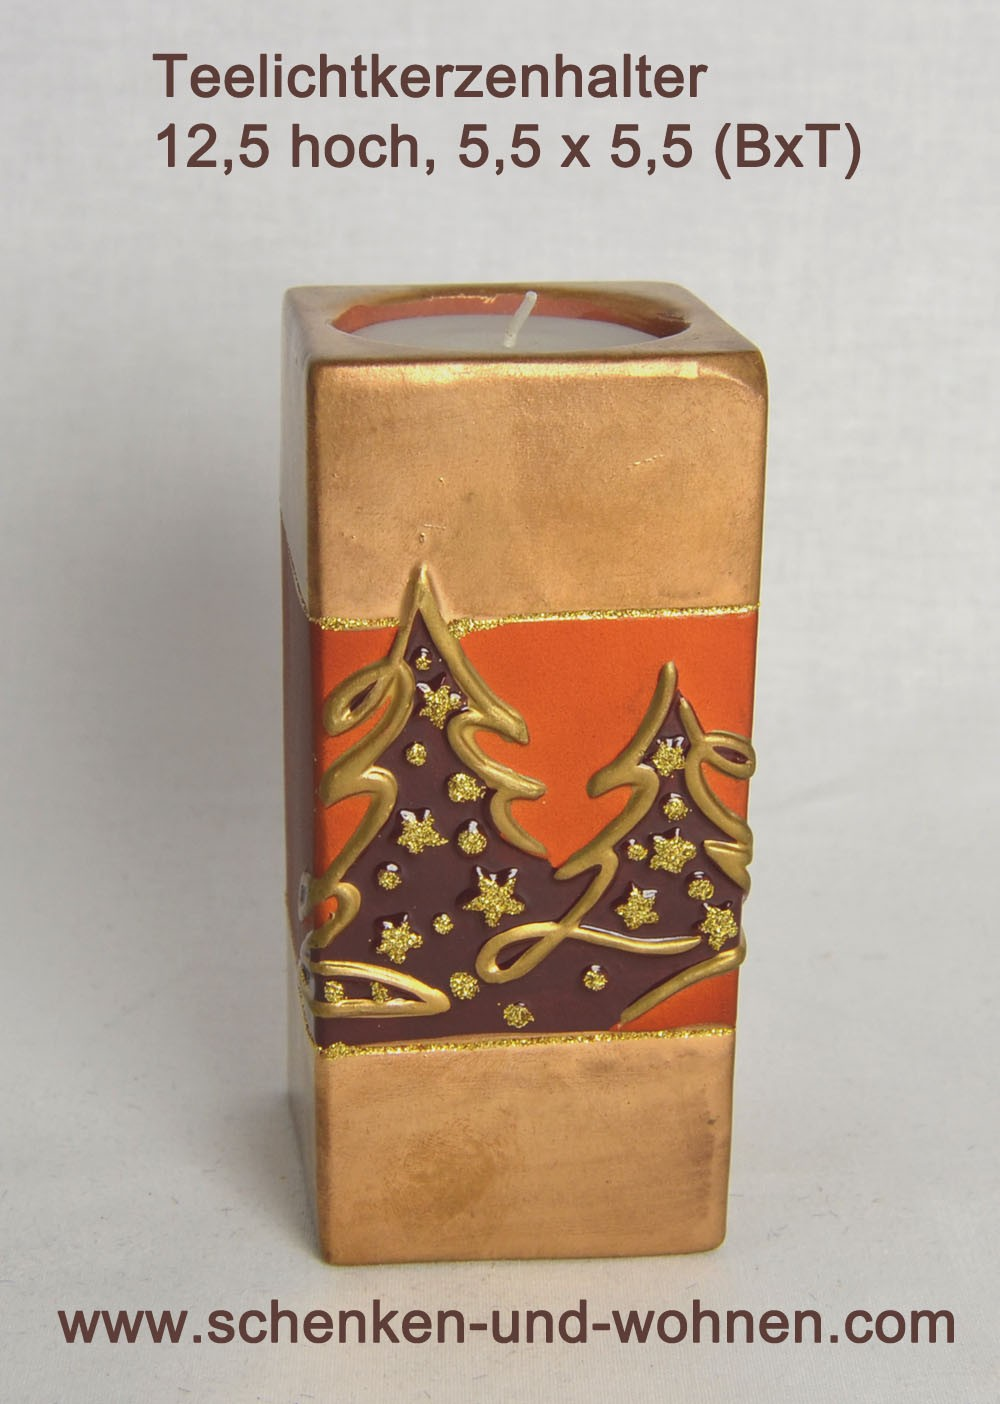 Teelichthalter antikgold Keramik 12,5x5,5x5,5 (HxBxT)